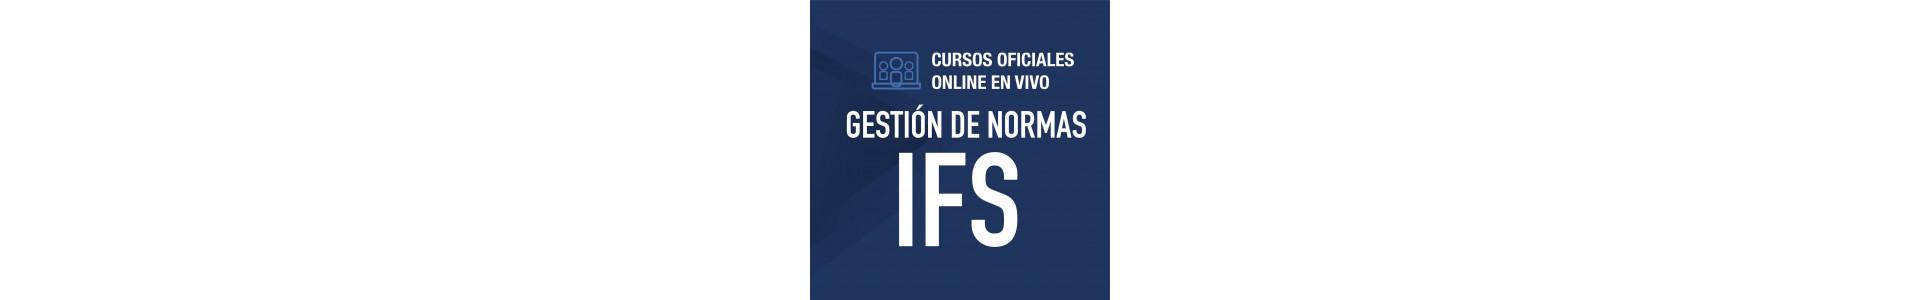 Cursos online | IFS